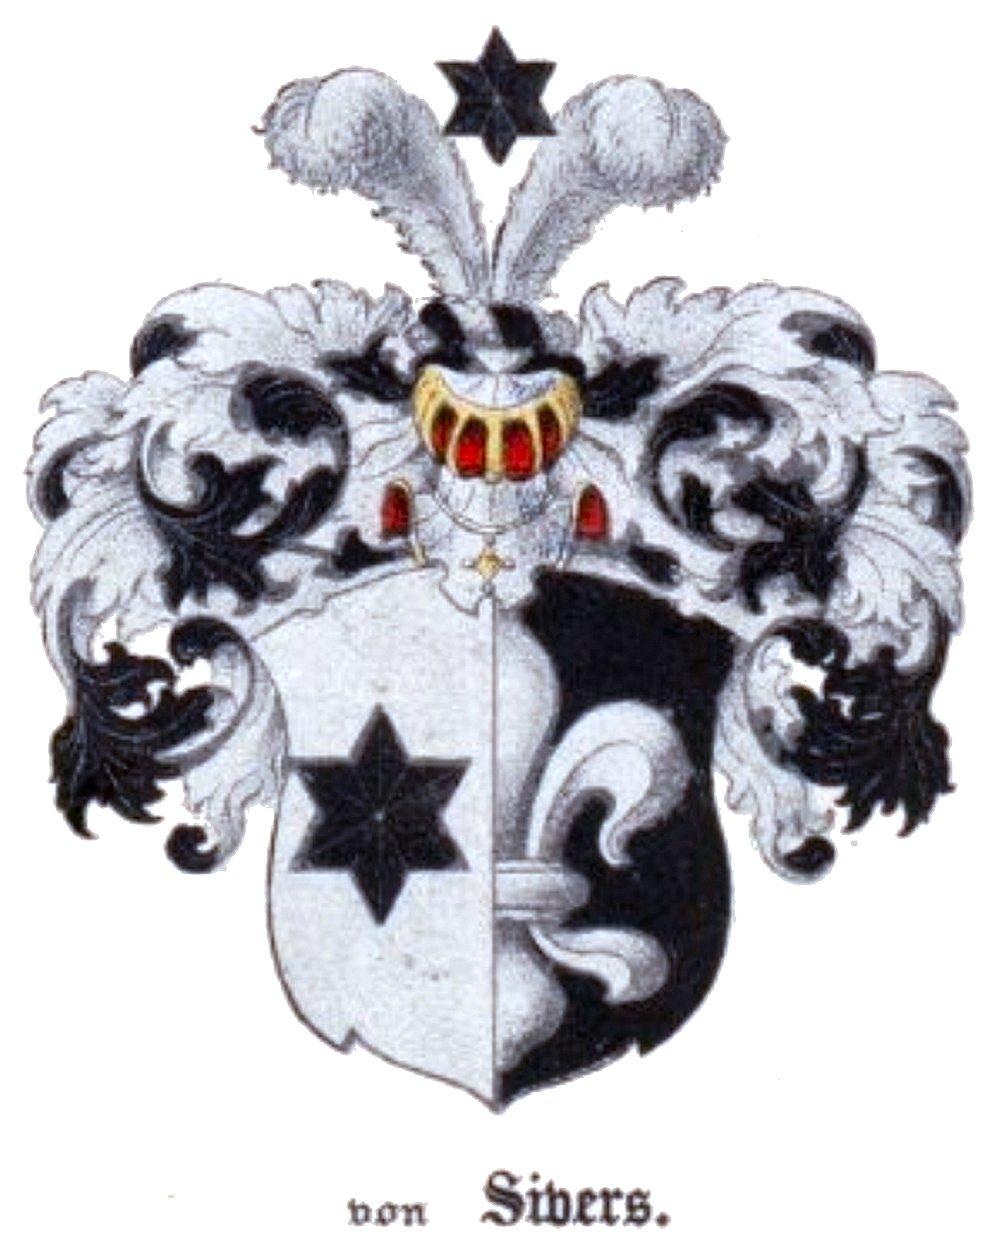 https://upload.wikimedia.org/wikipedia/commons/e/e7/Sivers_wappen.jpg